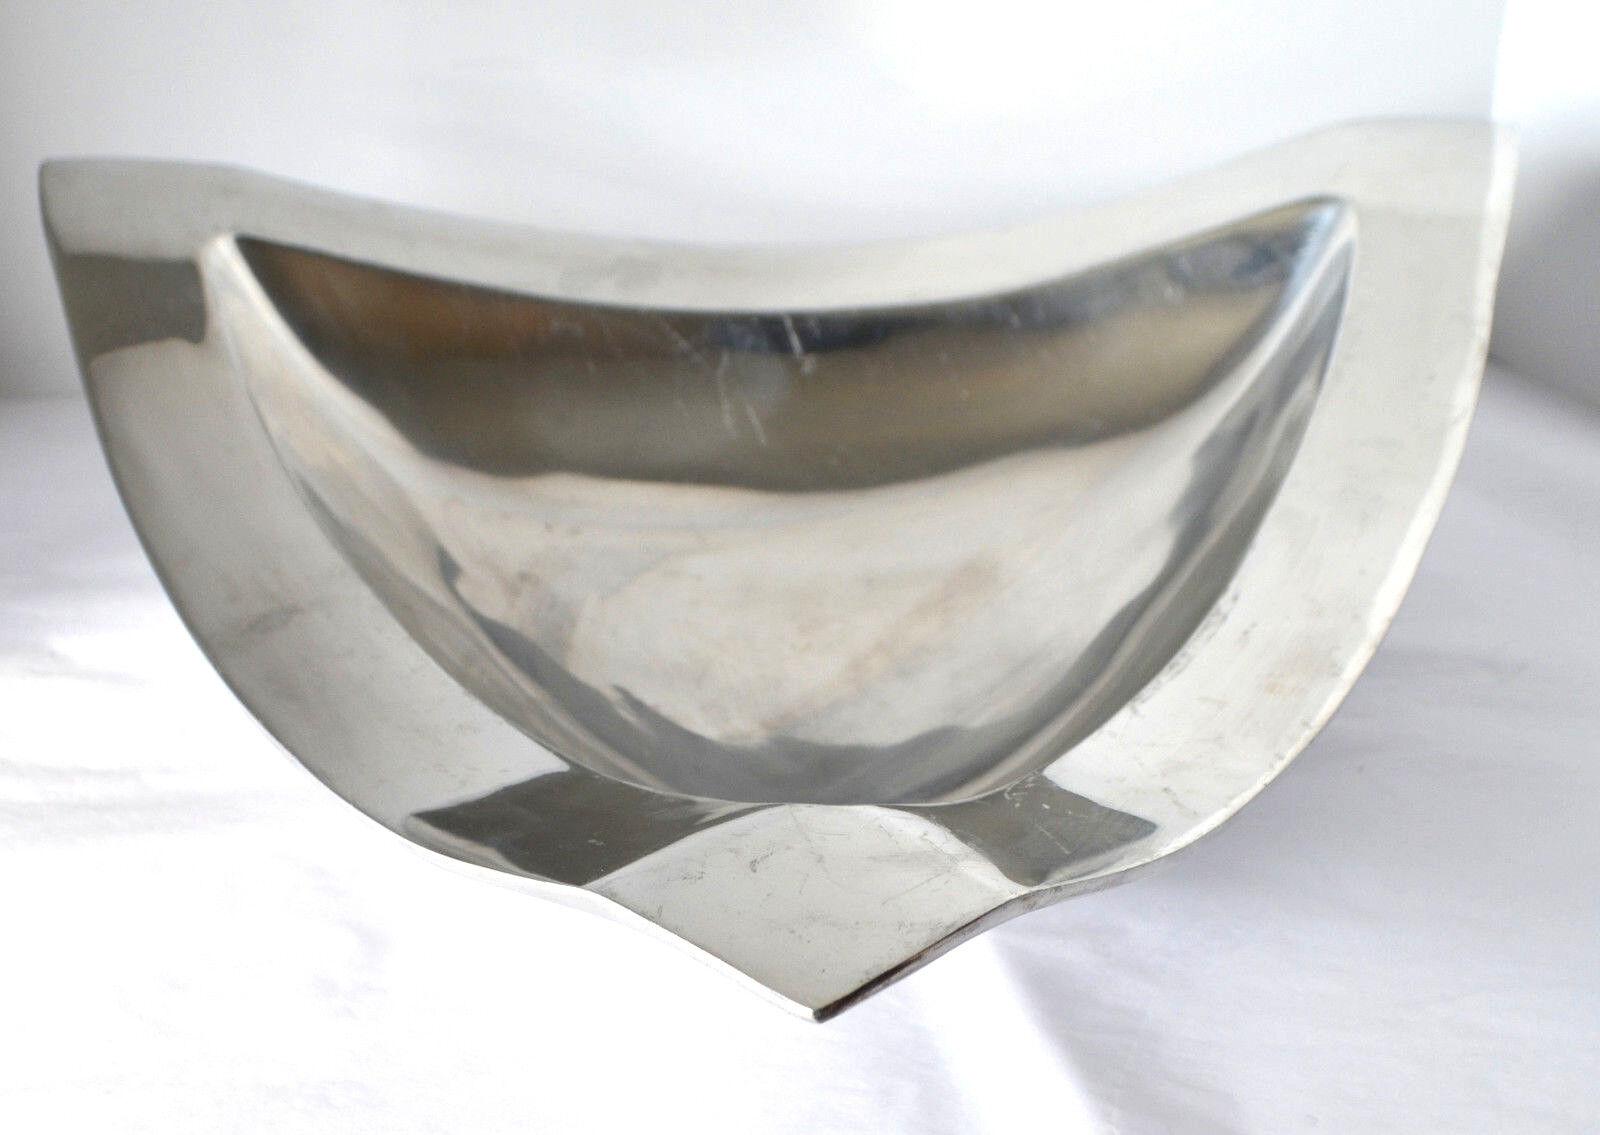 VTG Sant Andrea Triangular Metal Bowl Minimalist Oneida groß Fruit Serving Dish